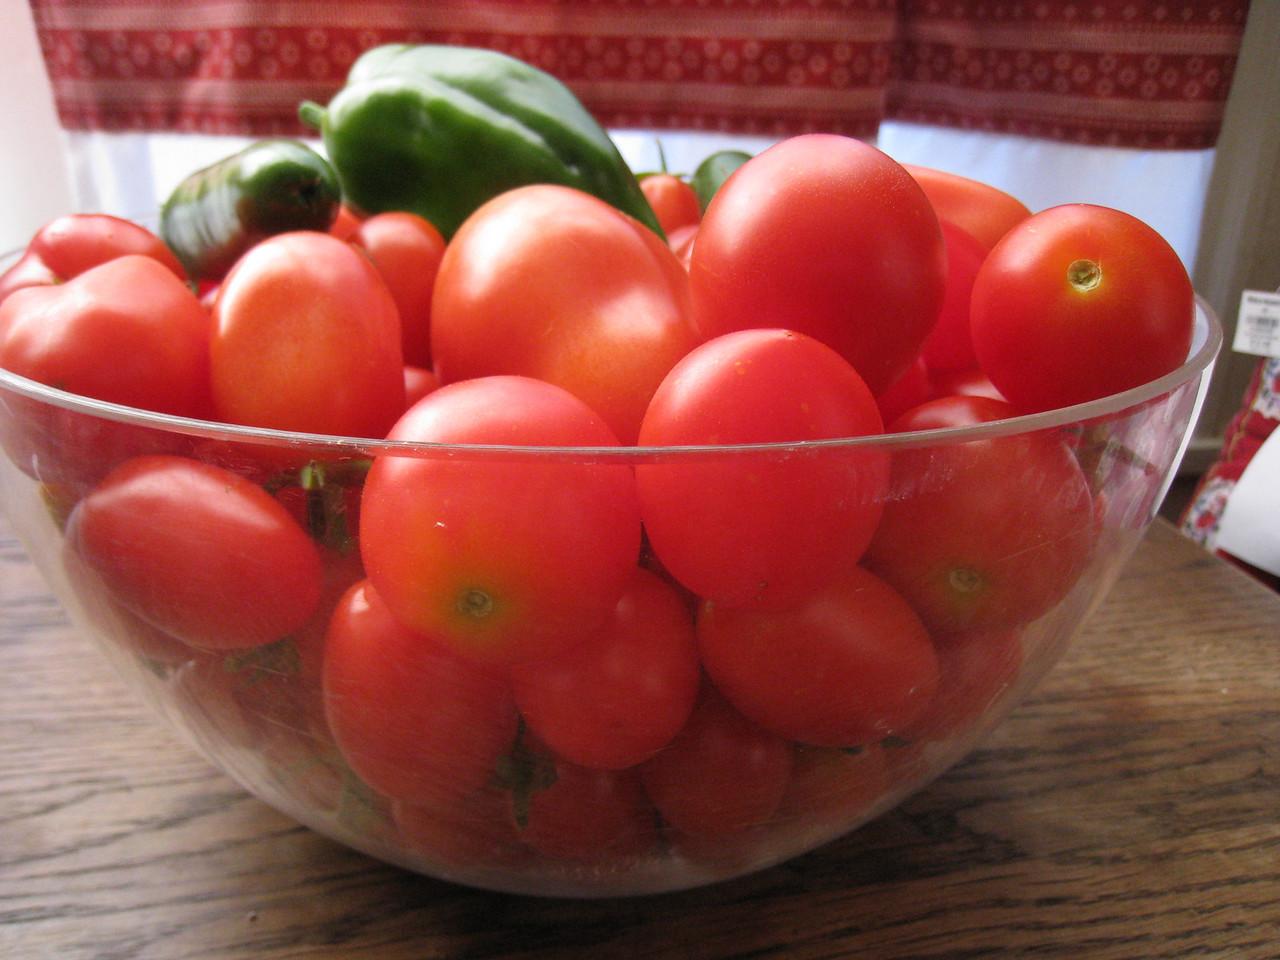 Tomato harvest begins!